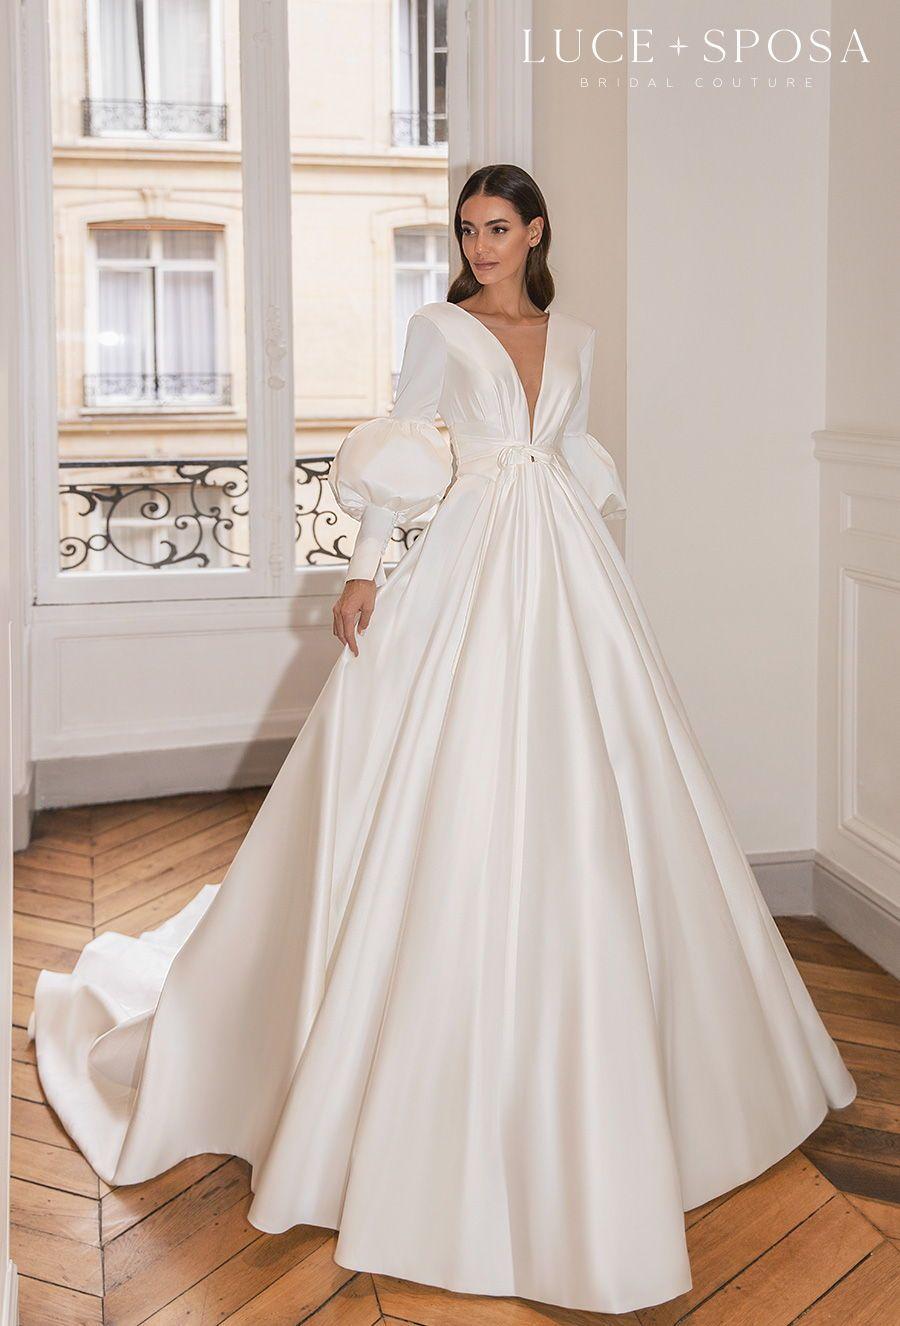 Luce Sposa Spring Summer 2021 Wedding Dresses Istanbul Paris Bridal Collections Wedding Inspirasi Wedding Dress Couture Ball Gowns Wedding Wedding Dresses [ 1326 x 900 Pixel ]